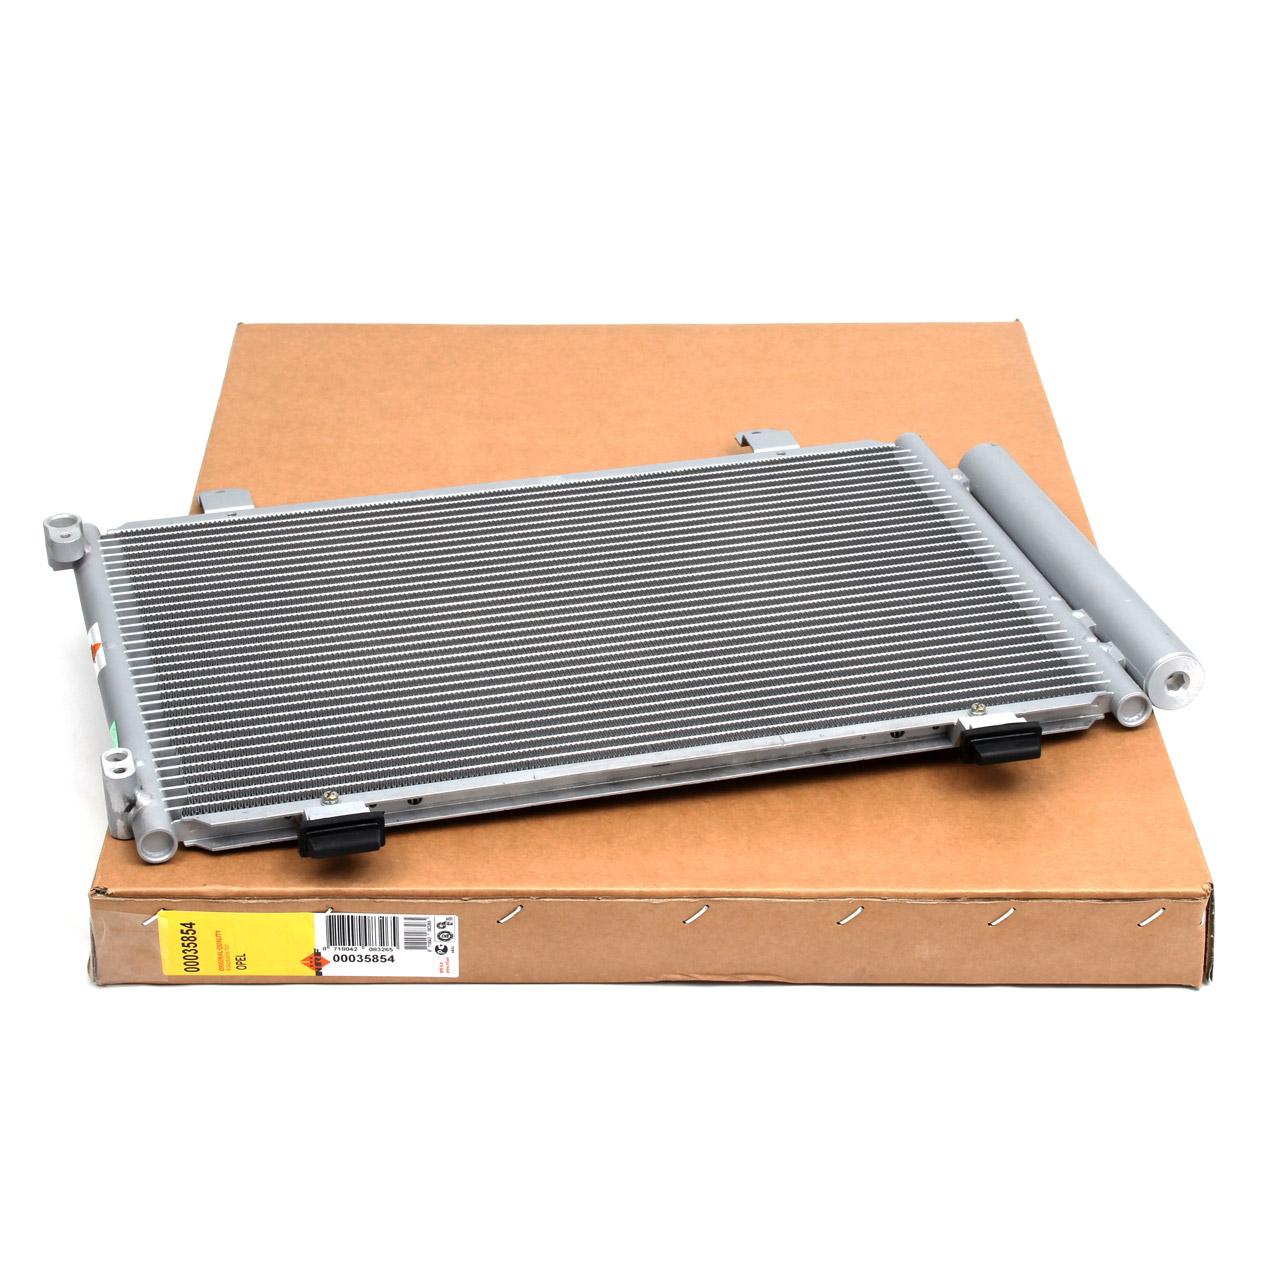 NRF 35854 Kondensator Klimakondensator EASY FIT OPEL Agila B H08 SUZUKI Splash EX 1.0 1.2